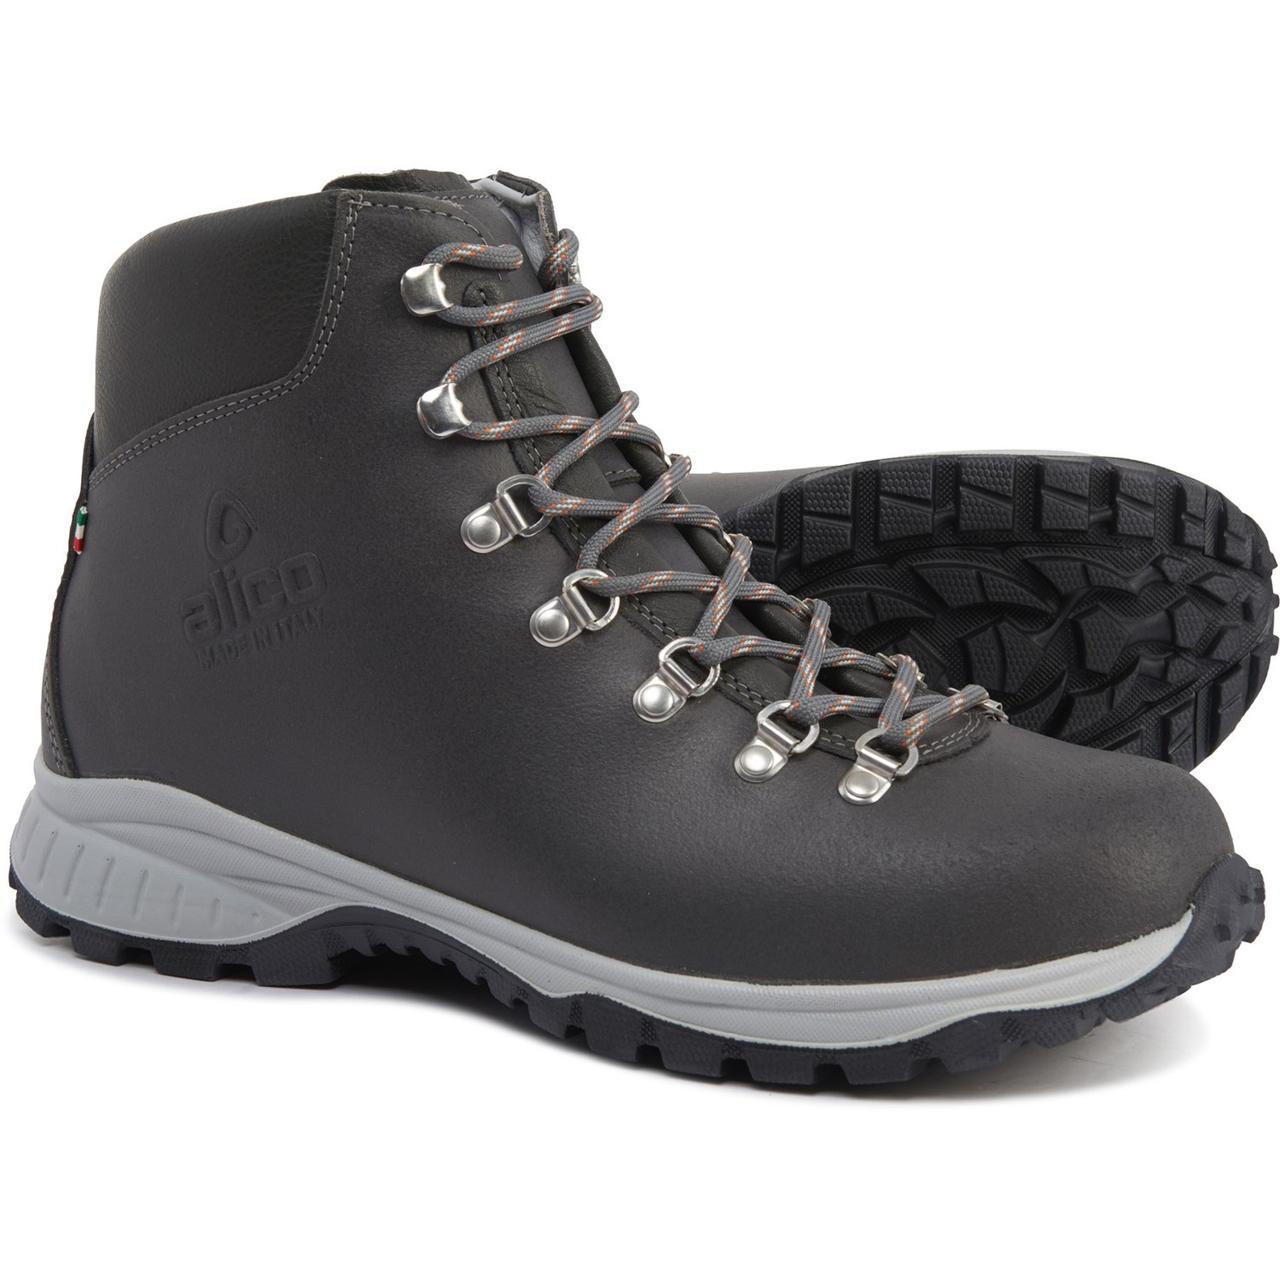 Ботинки трекинговые Alico Sherpa (Код ASHPG-48)